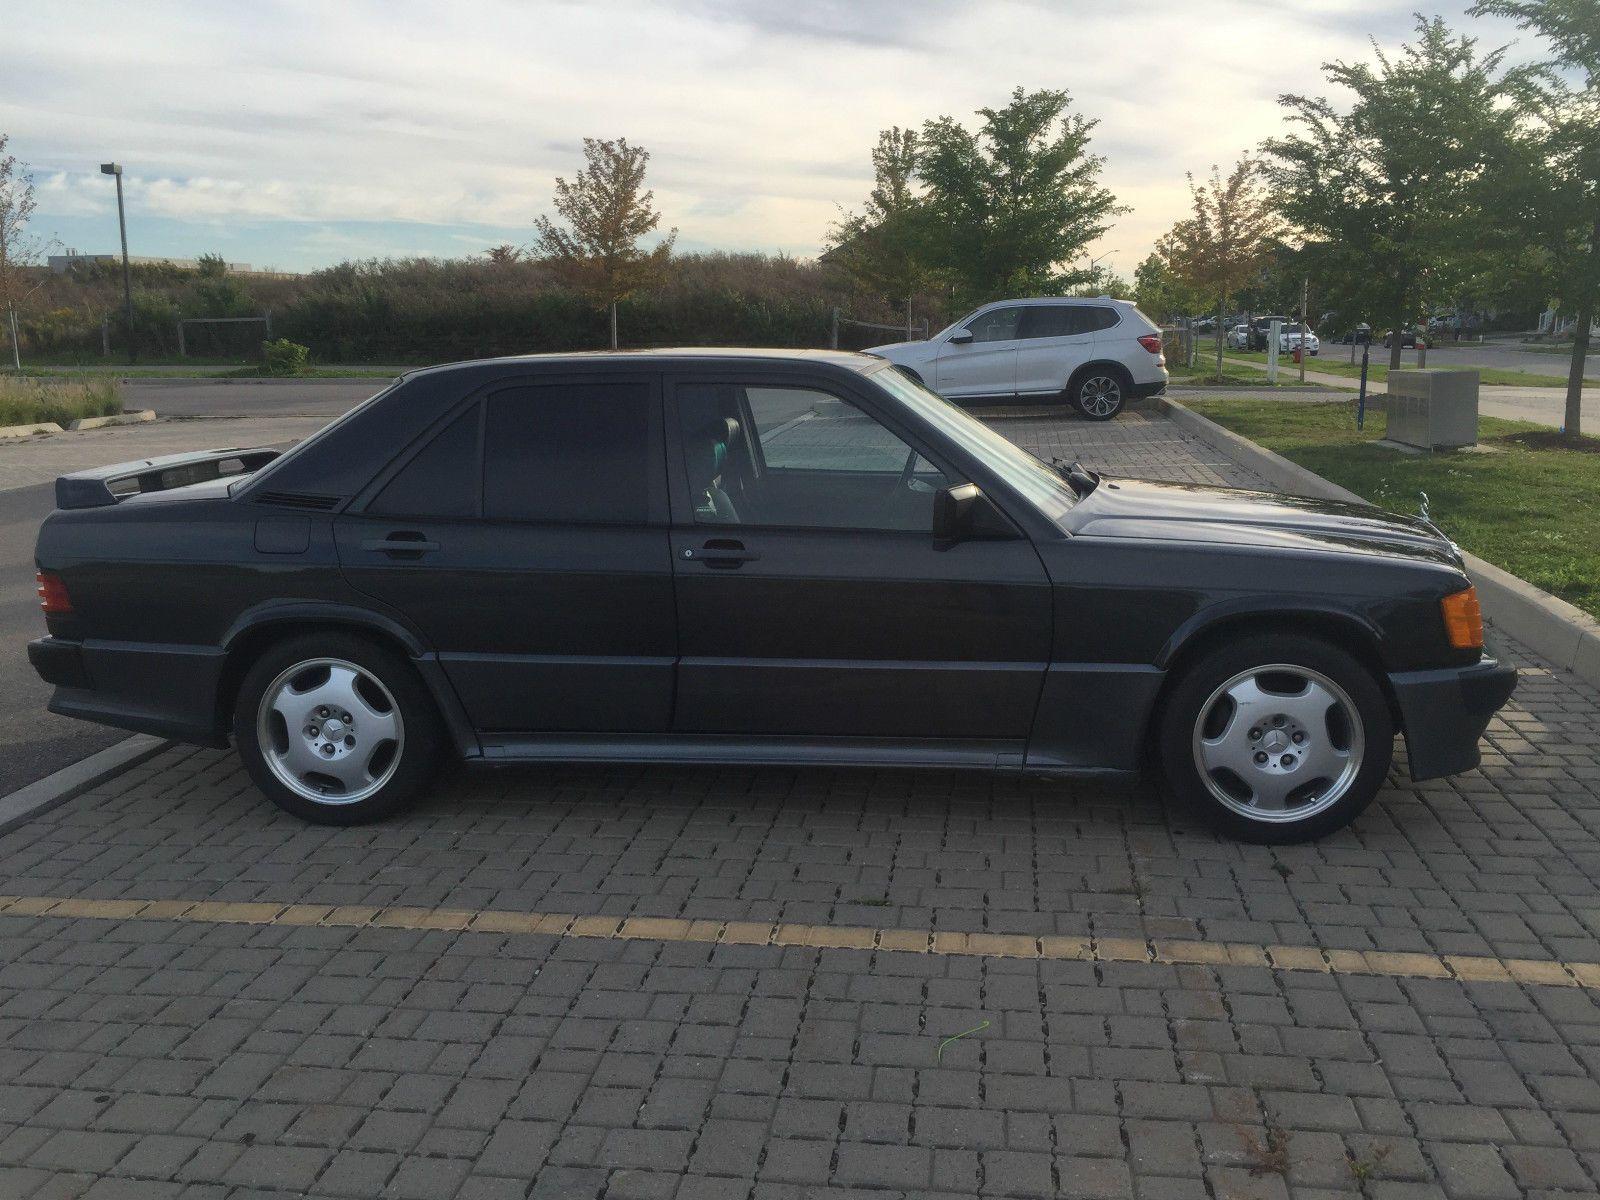 http://www.ebay.com/itm/1987-Mercedes-Benz-190-Series-COSWORTH-16V-2 ...